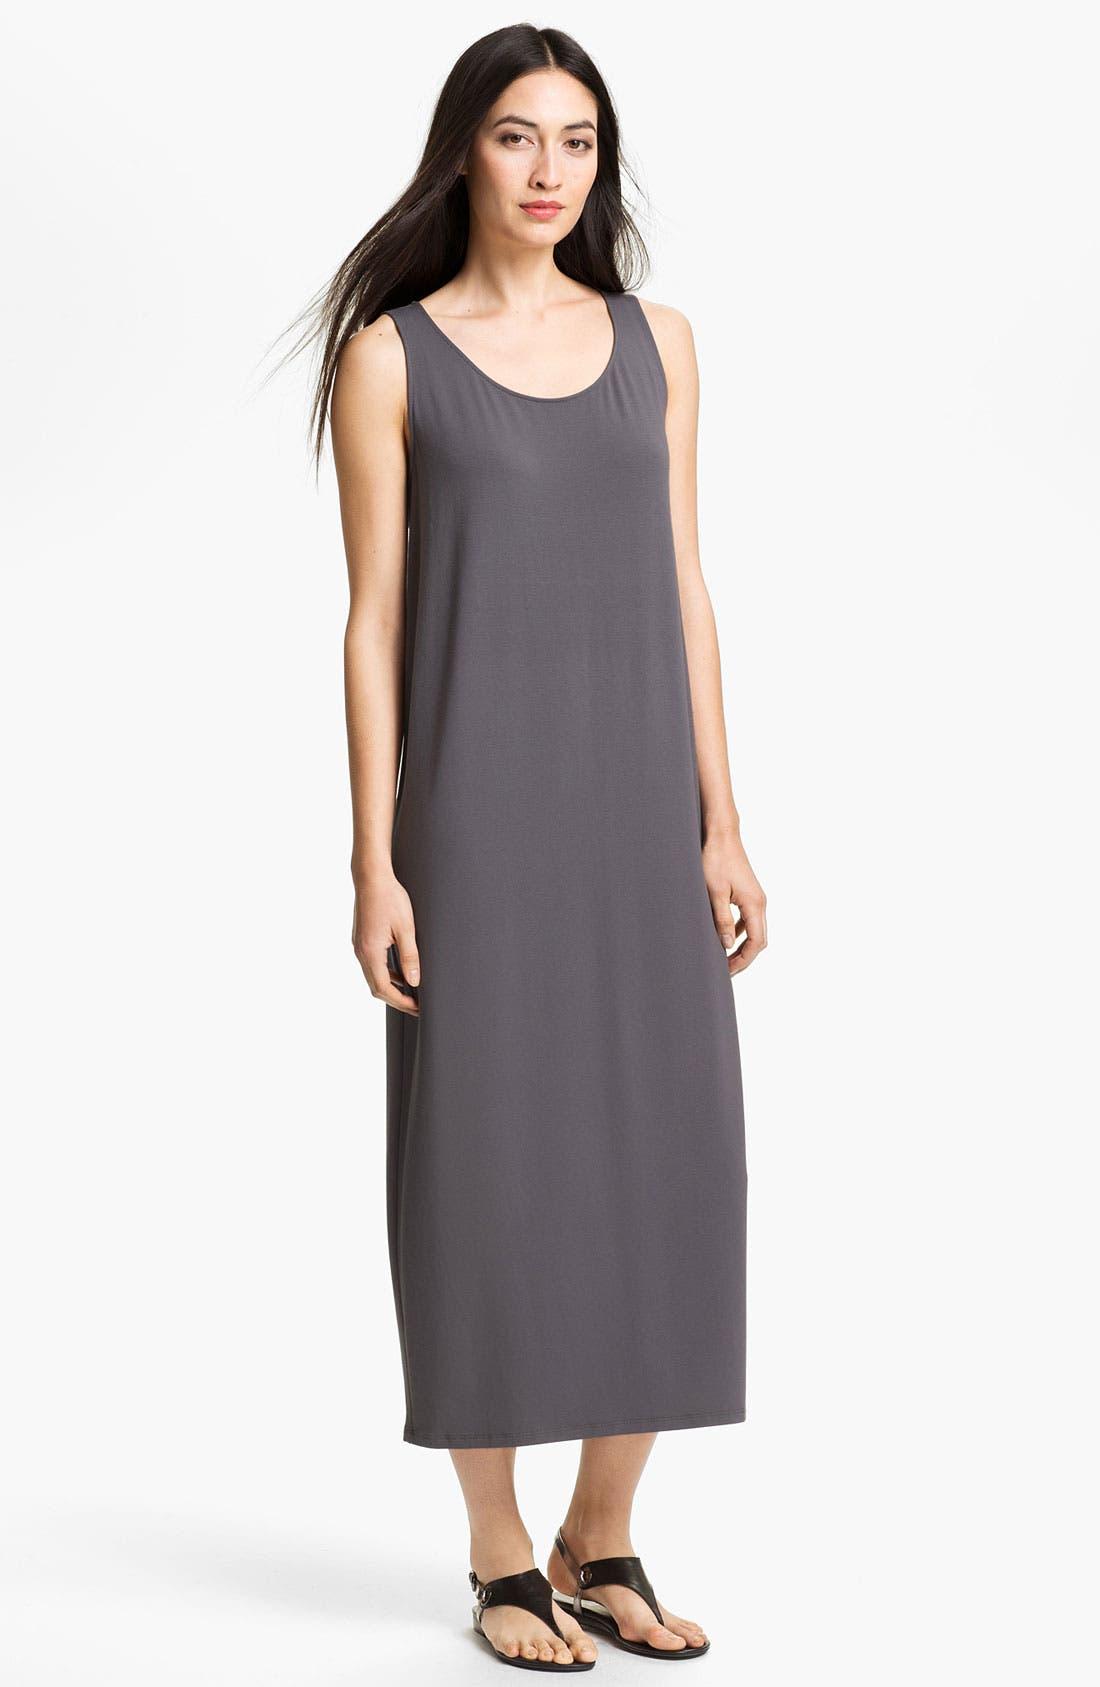 Main Image - Eileen Fisher Scoop Neck Sleeveless Dress